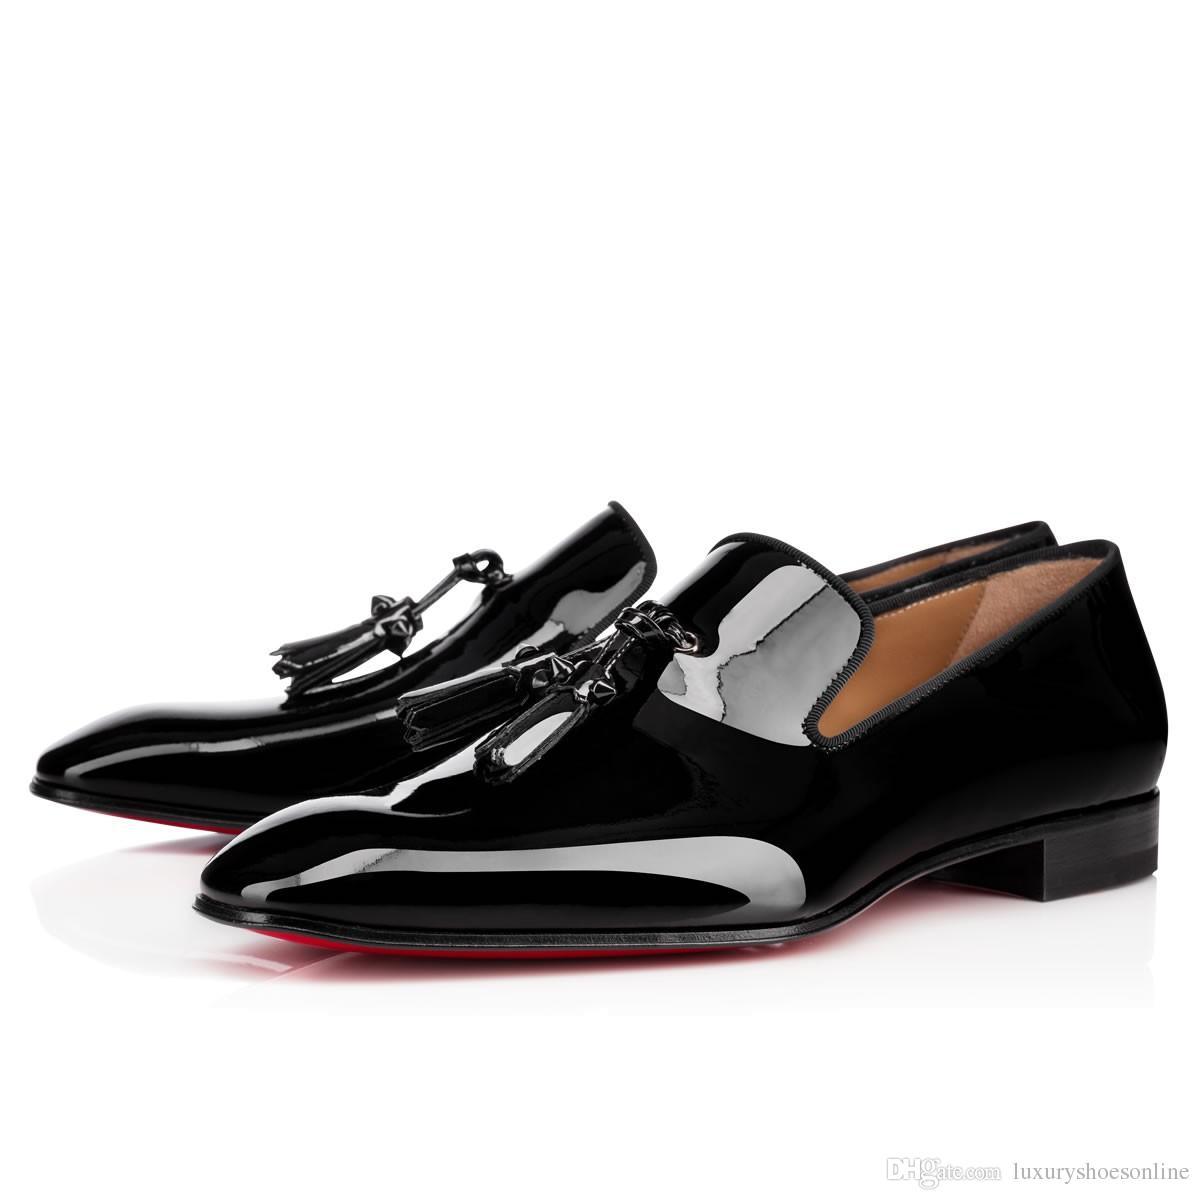 fa84d7a1e43 Business Party Wedding Fashion Red Bottom Dandelion Tassel Flats Loafers  Shoes Luxury Men,Women Luxurious Walking Wedding Party Dress